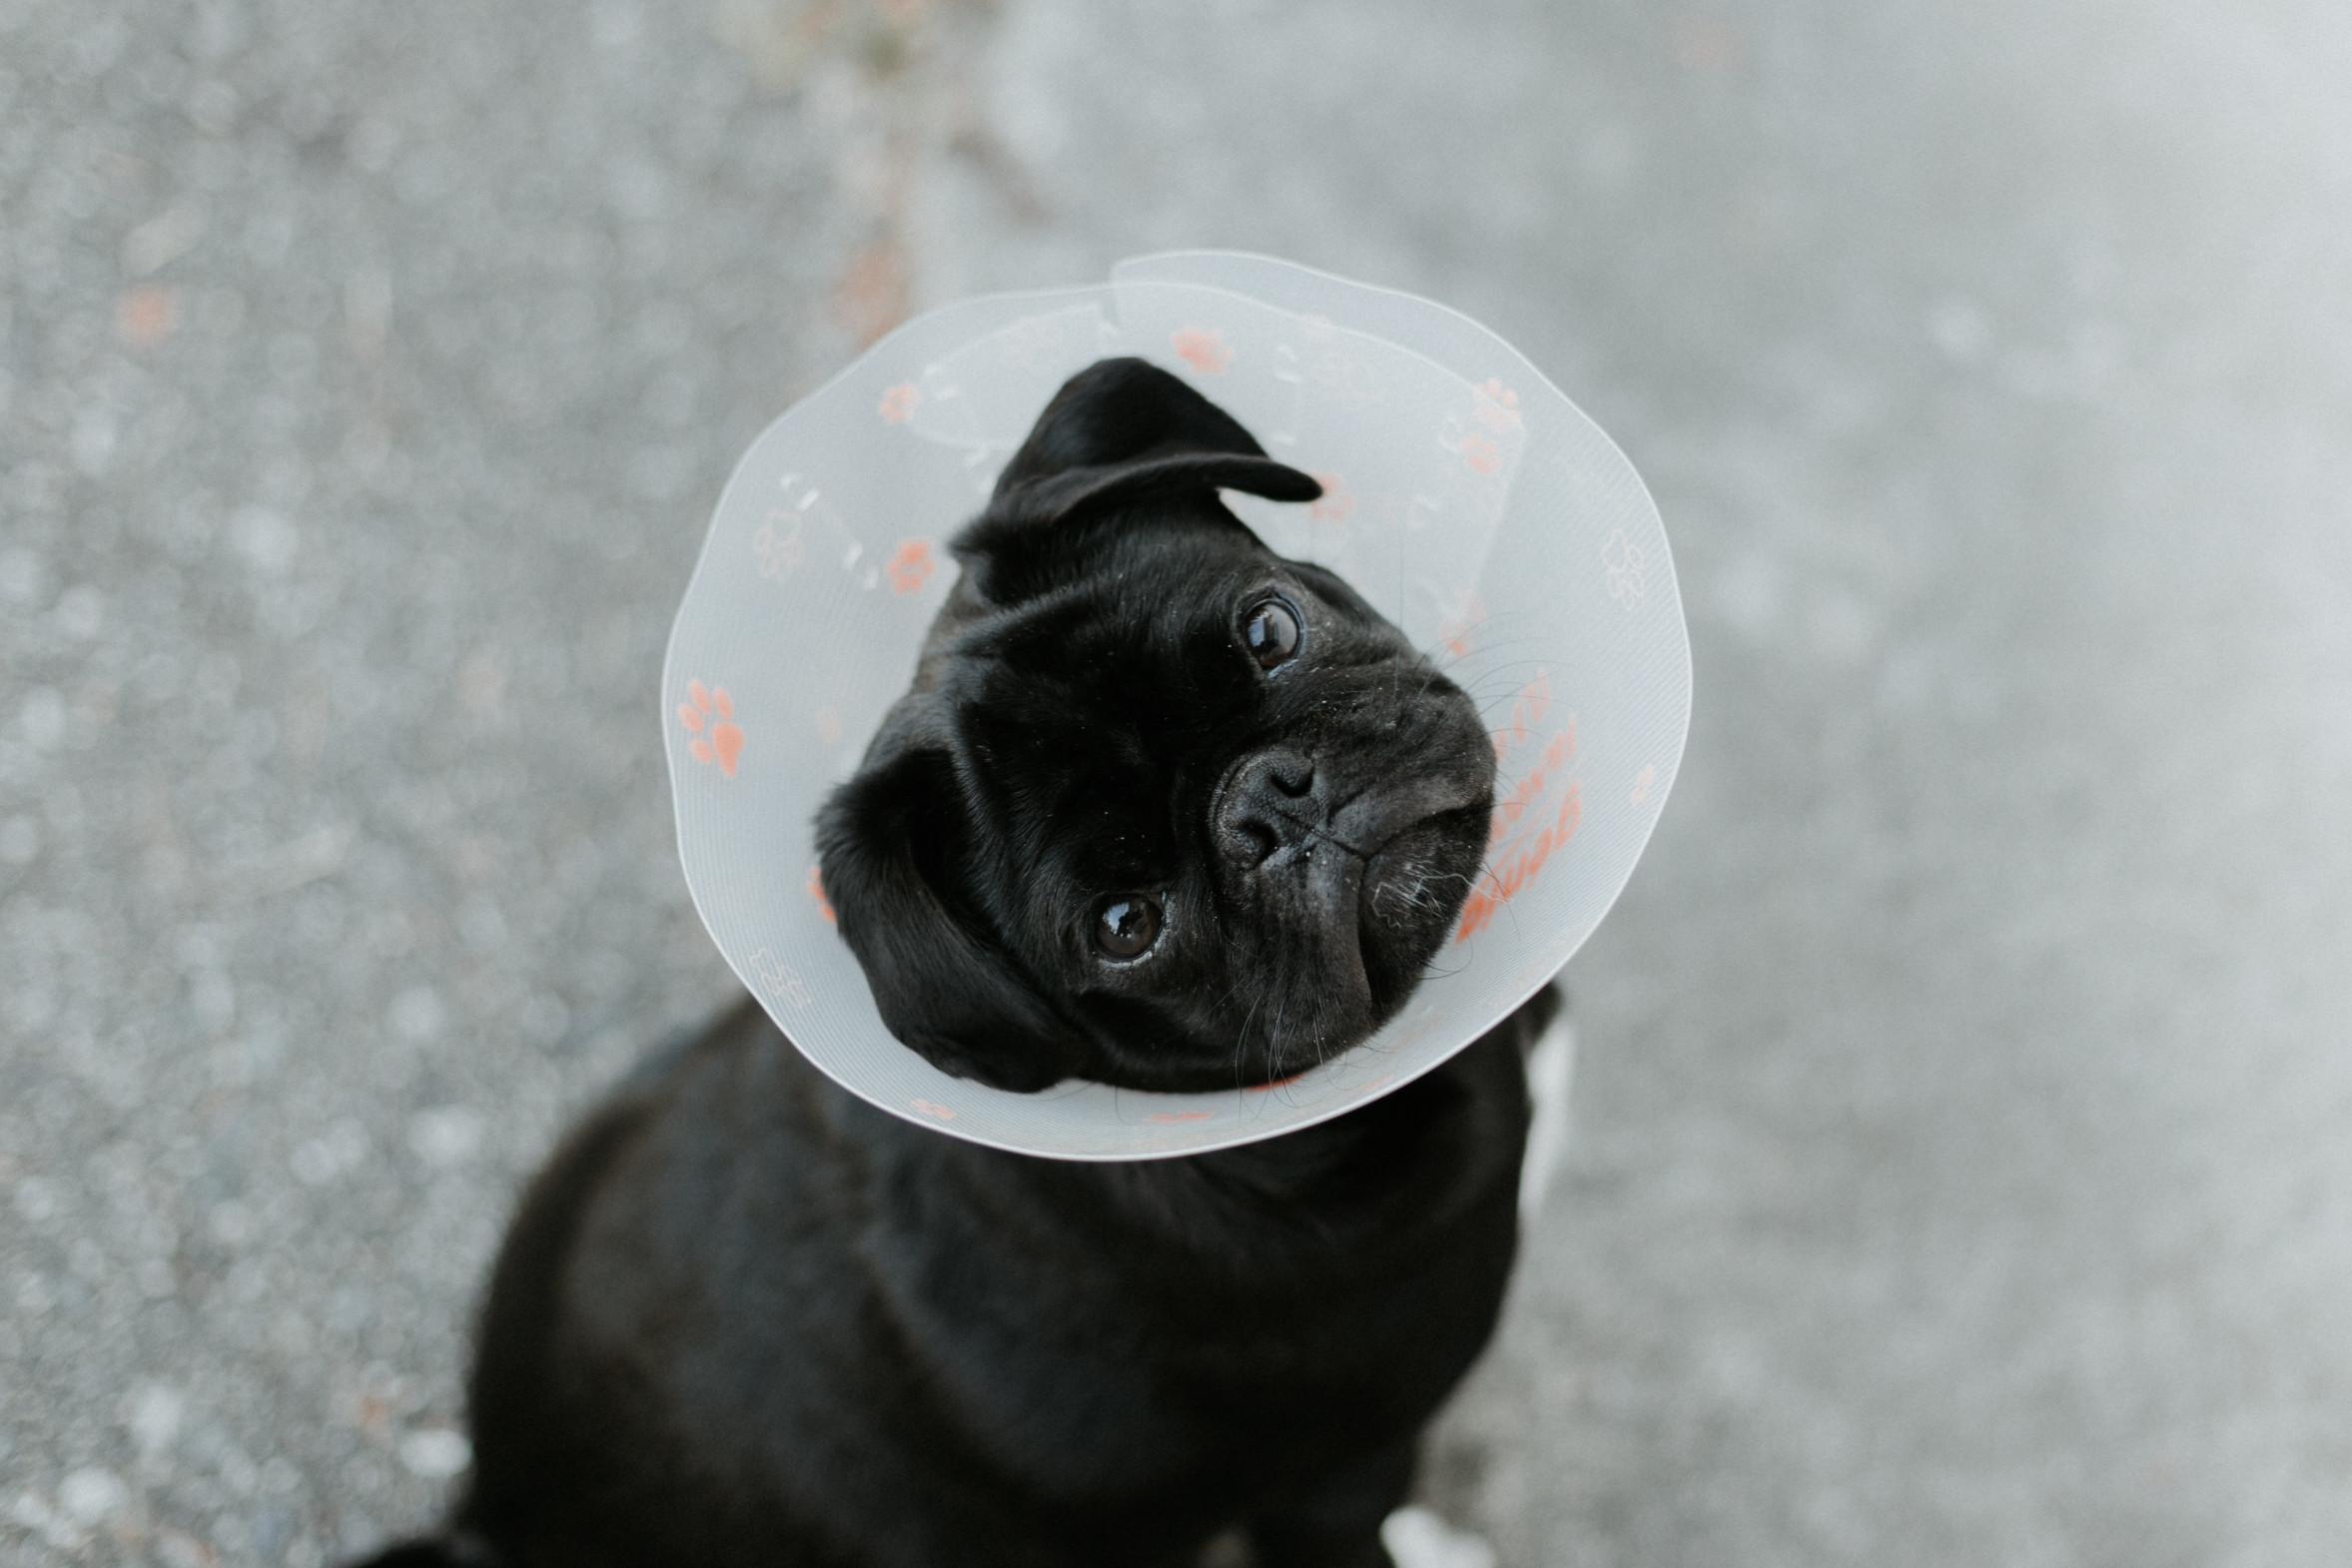 Dog in a lampshade Credit Priscilla Du Preez